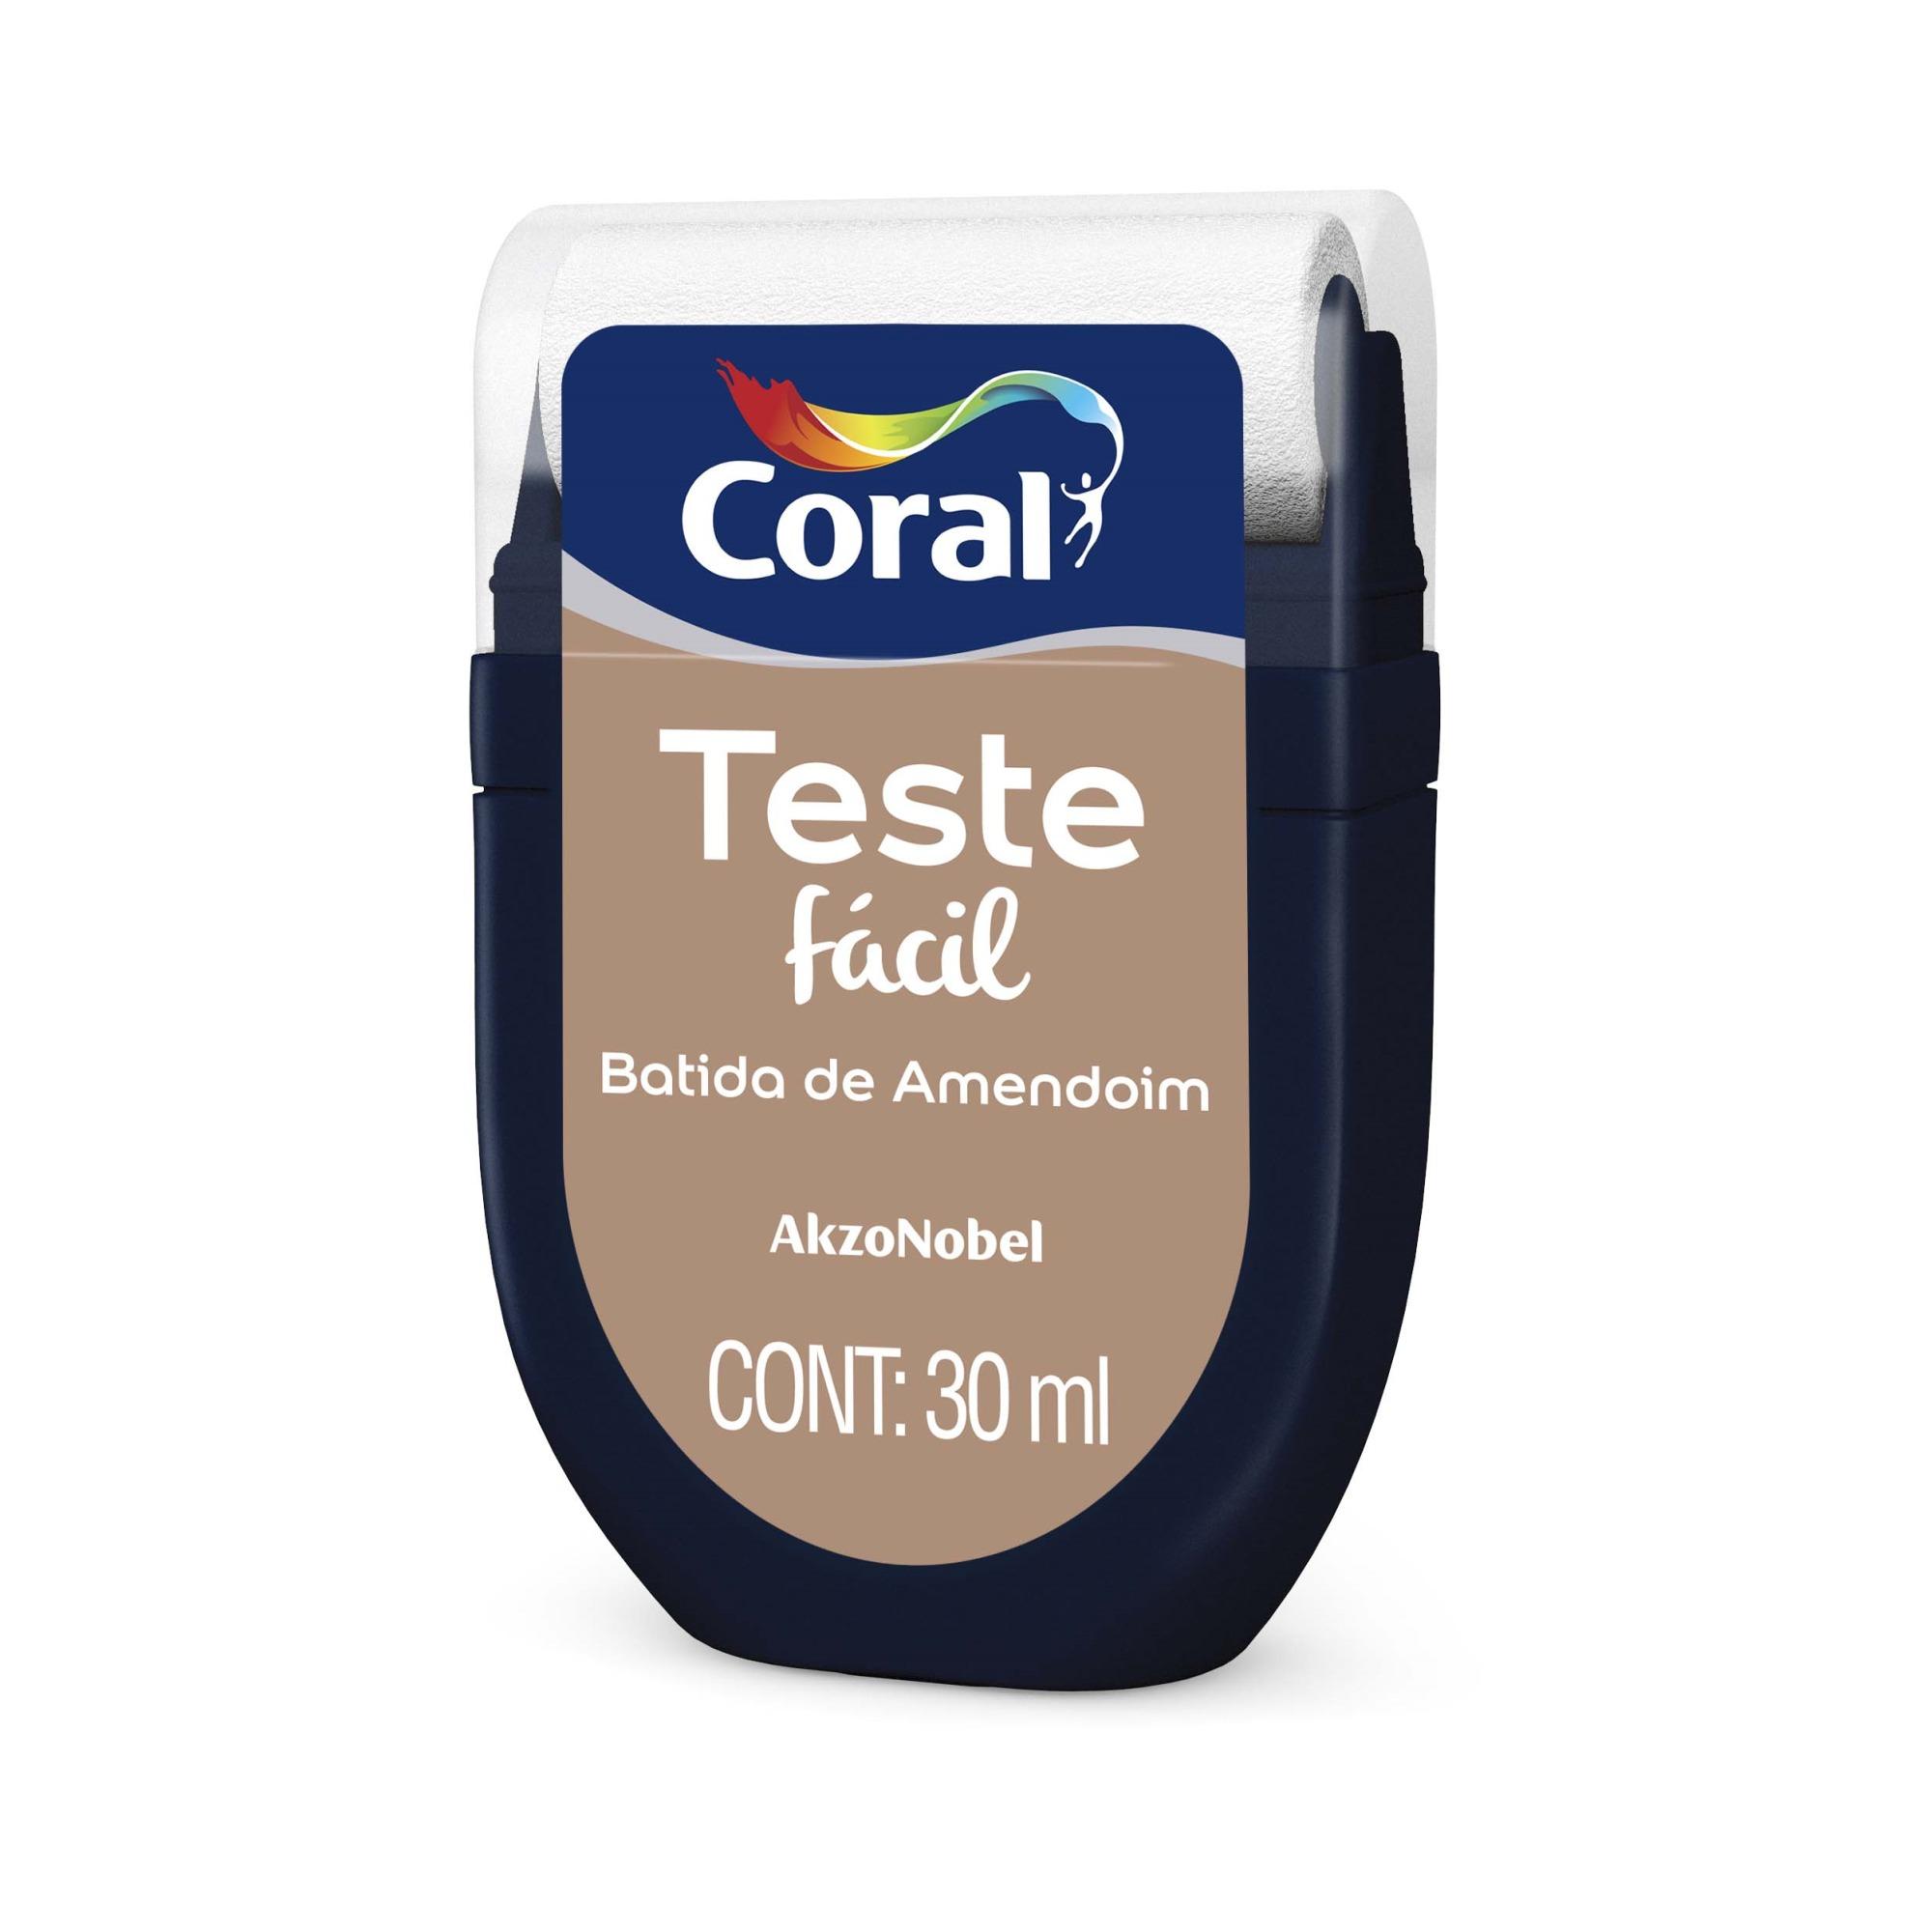 Teste Facil 30ml Batida de Amendoim - Coral